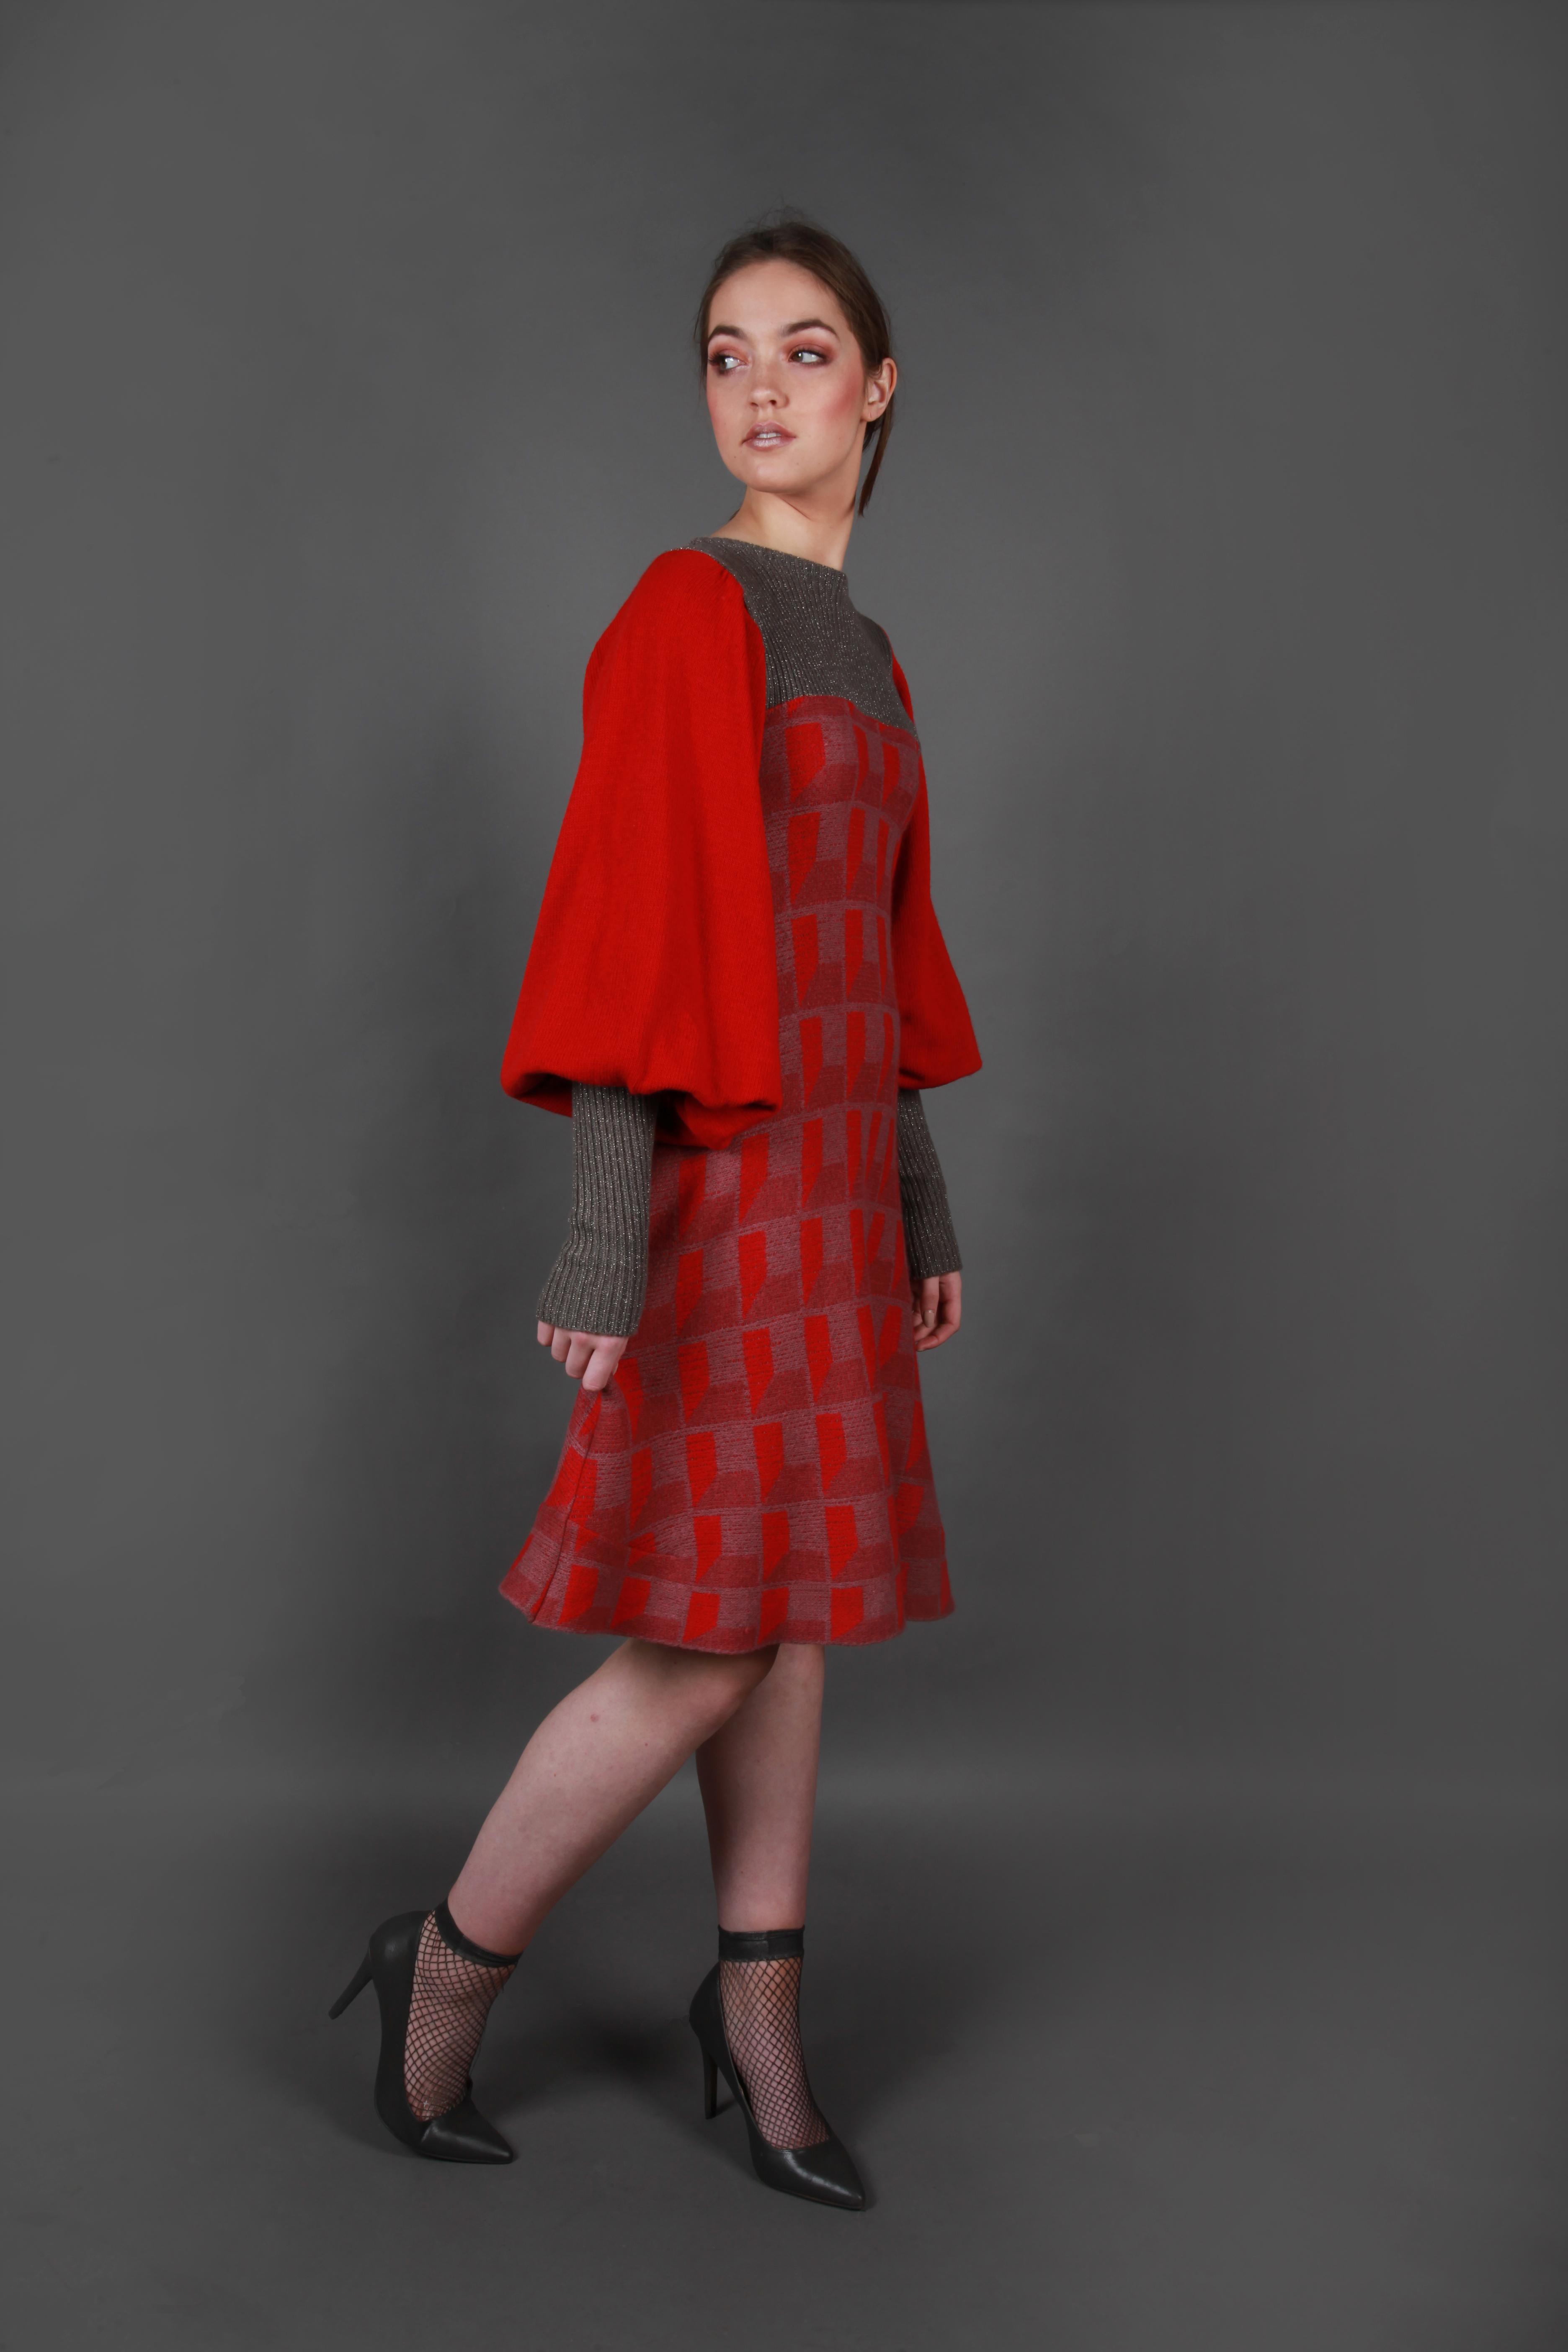 Pattern square dress